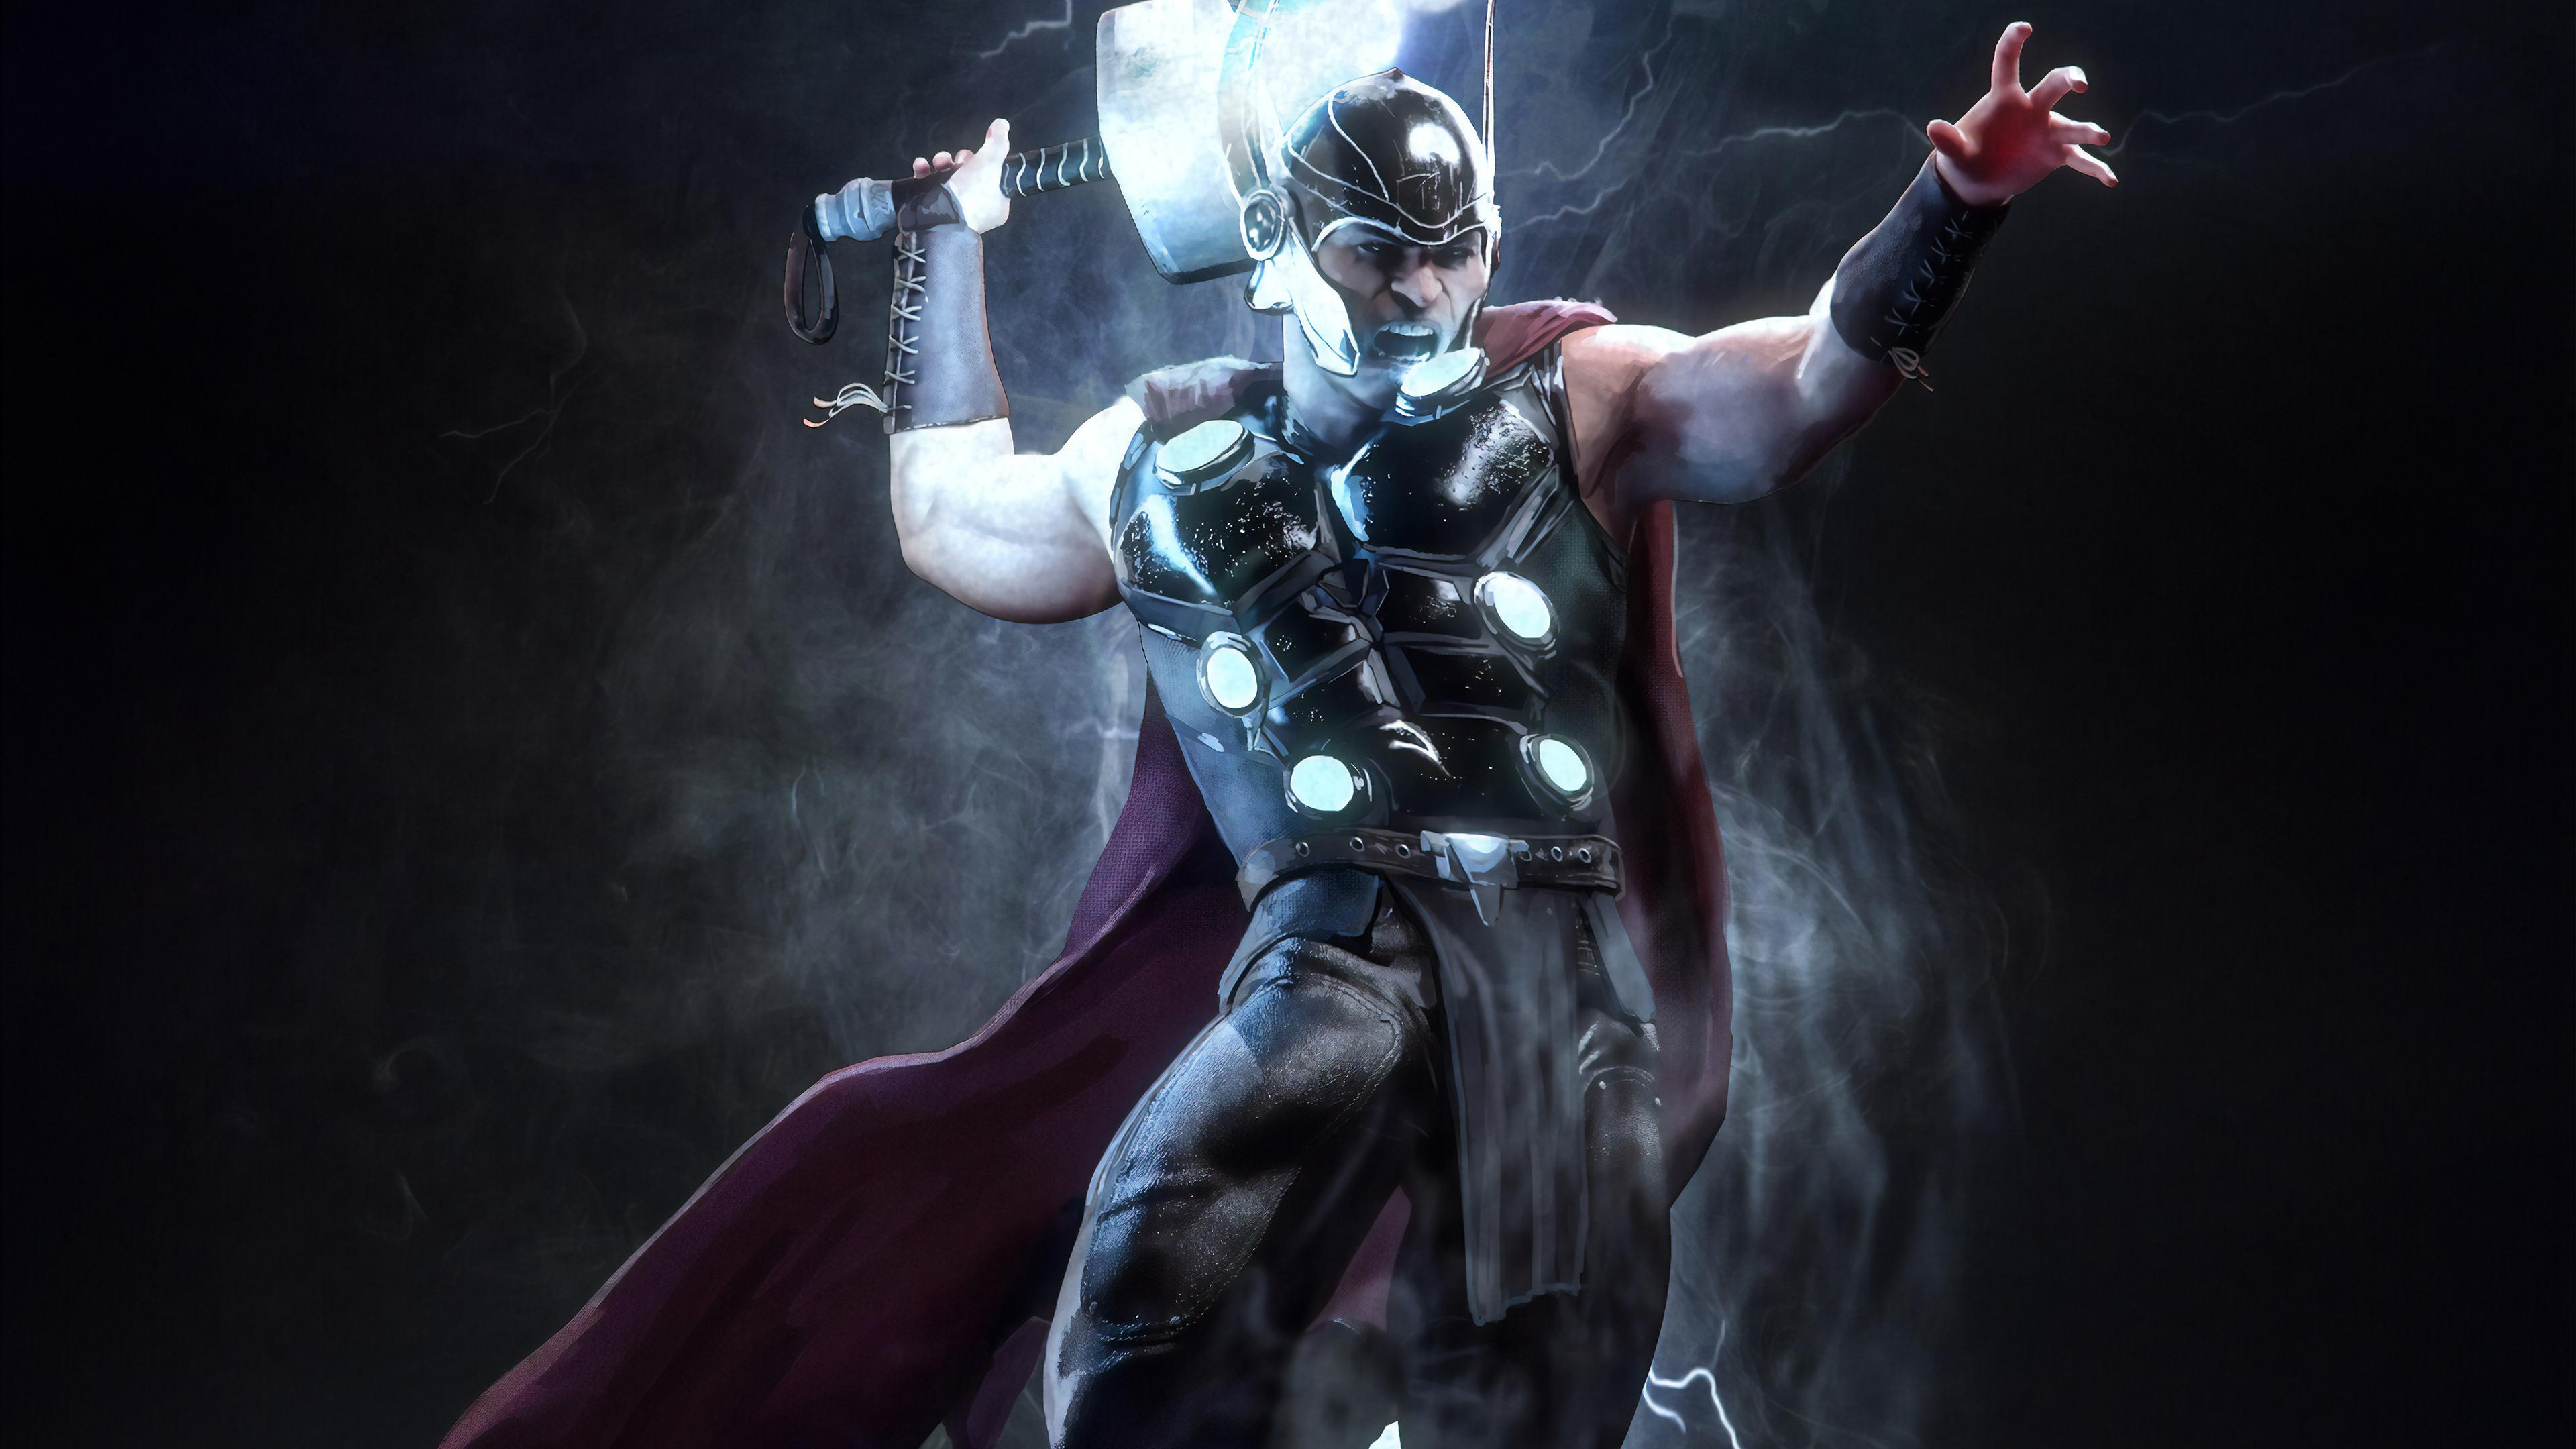 thor marvel superhero 1565052823 - Thor Marvel Superhero - thor wallpapers, superheroes wallpapers, marvel wallpapers, hd-wallpapers, artstation wallpapers, 4k-wallpapers